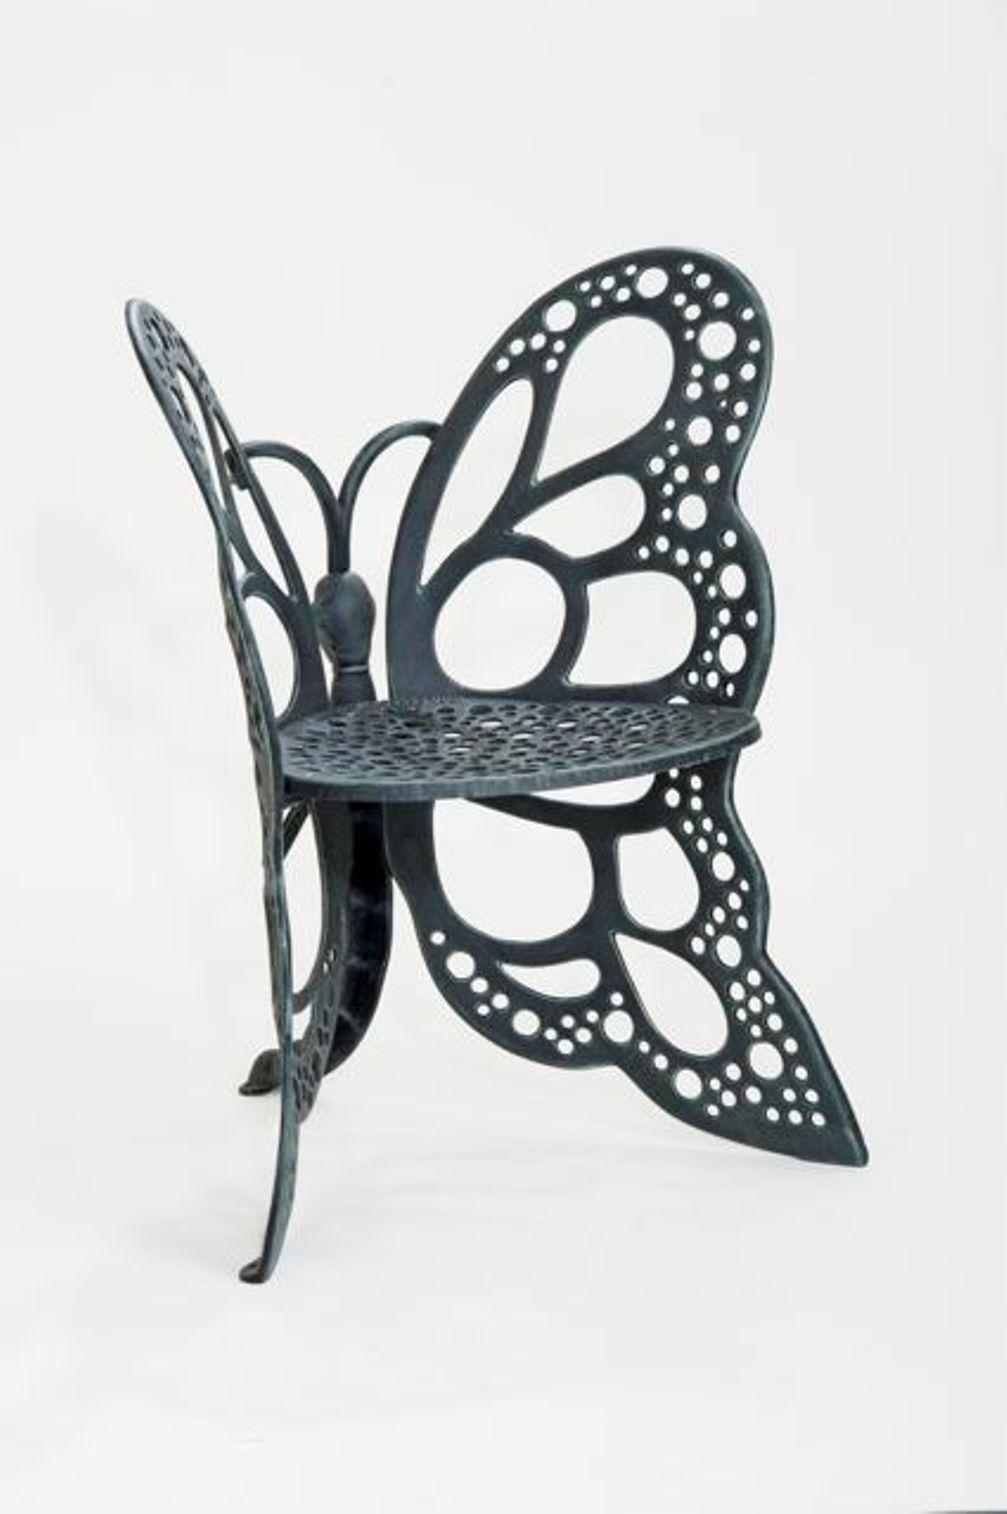 Walmart Furniture Online: FlowerHouse FHBC205 Butterfly Chair